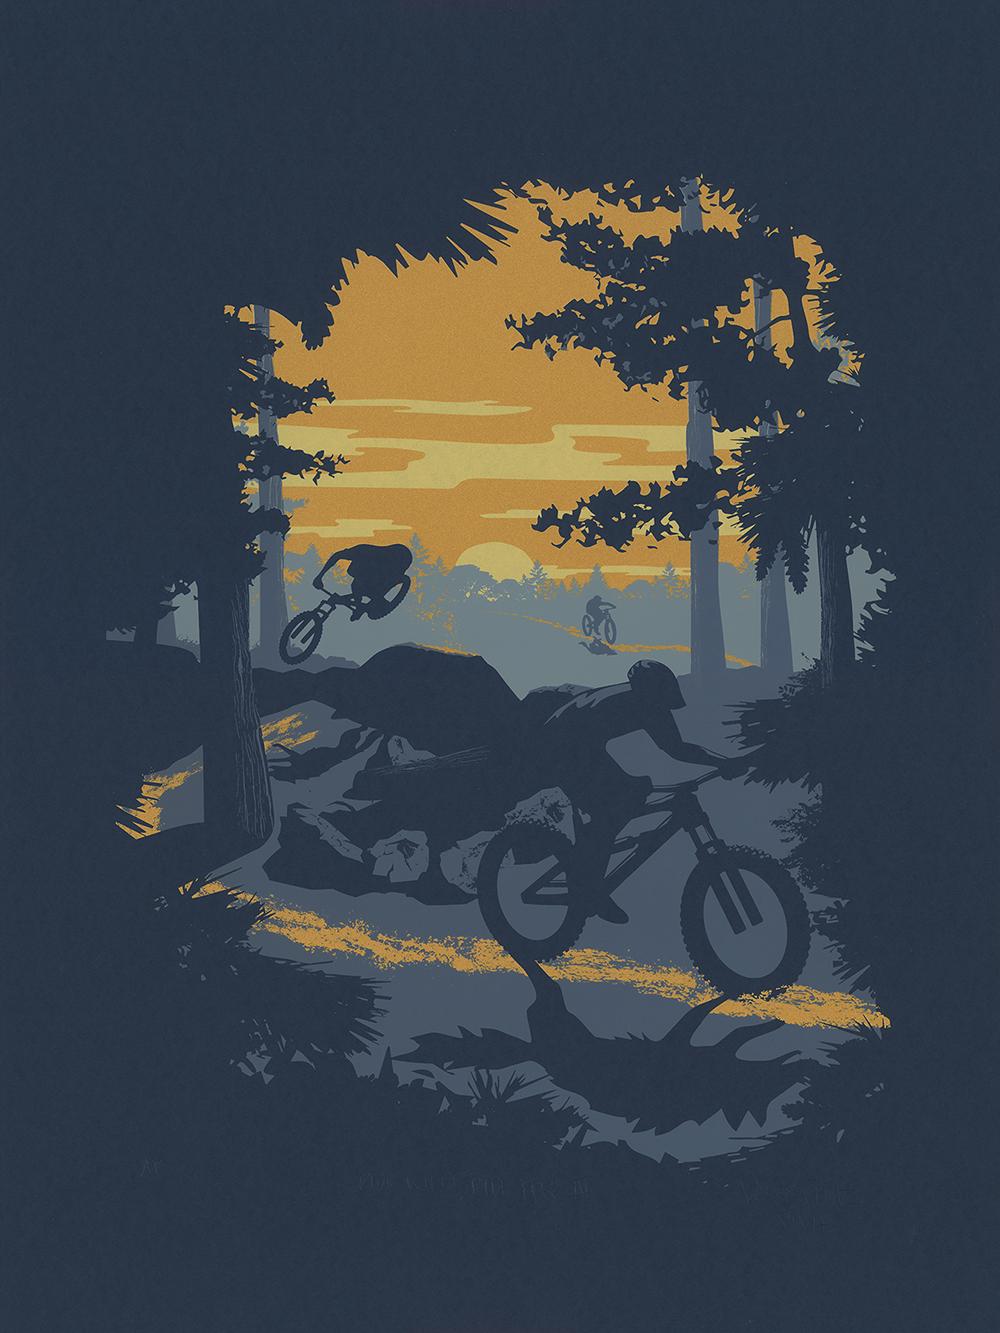 Ride Wild. Ride Free. I